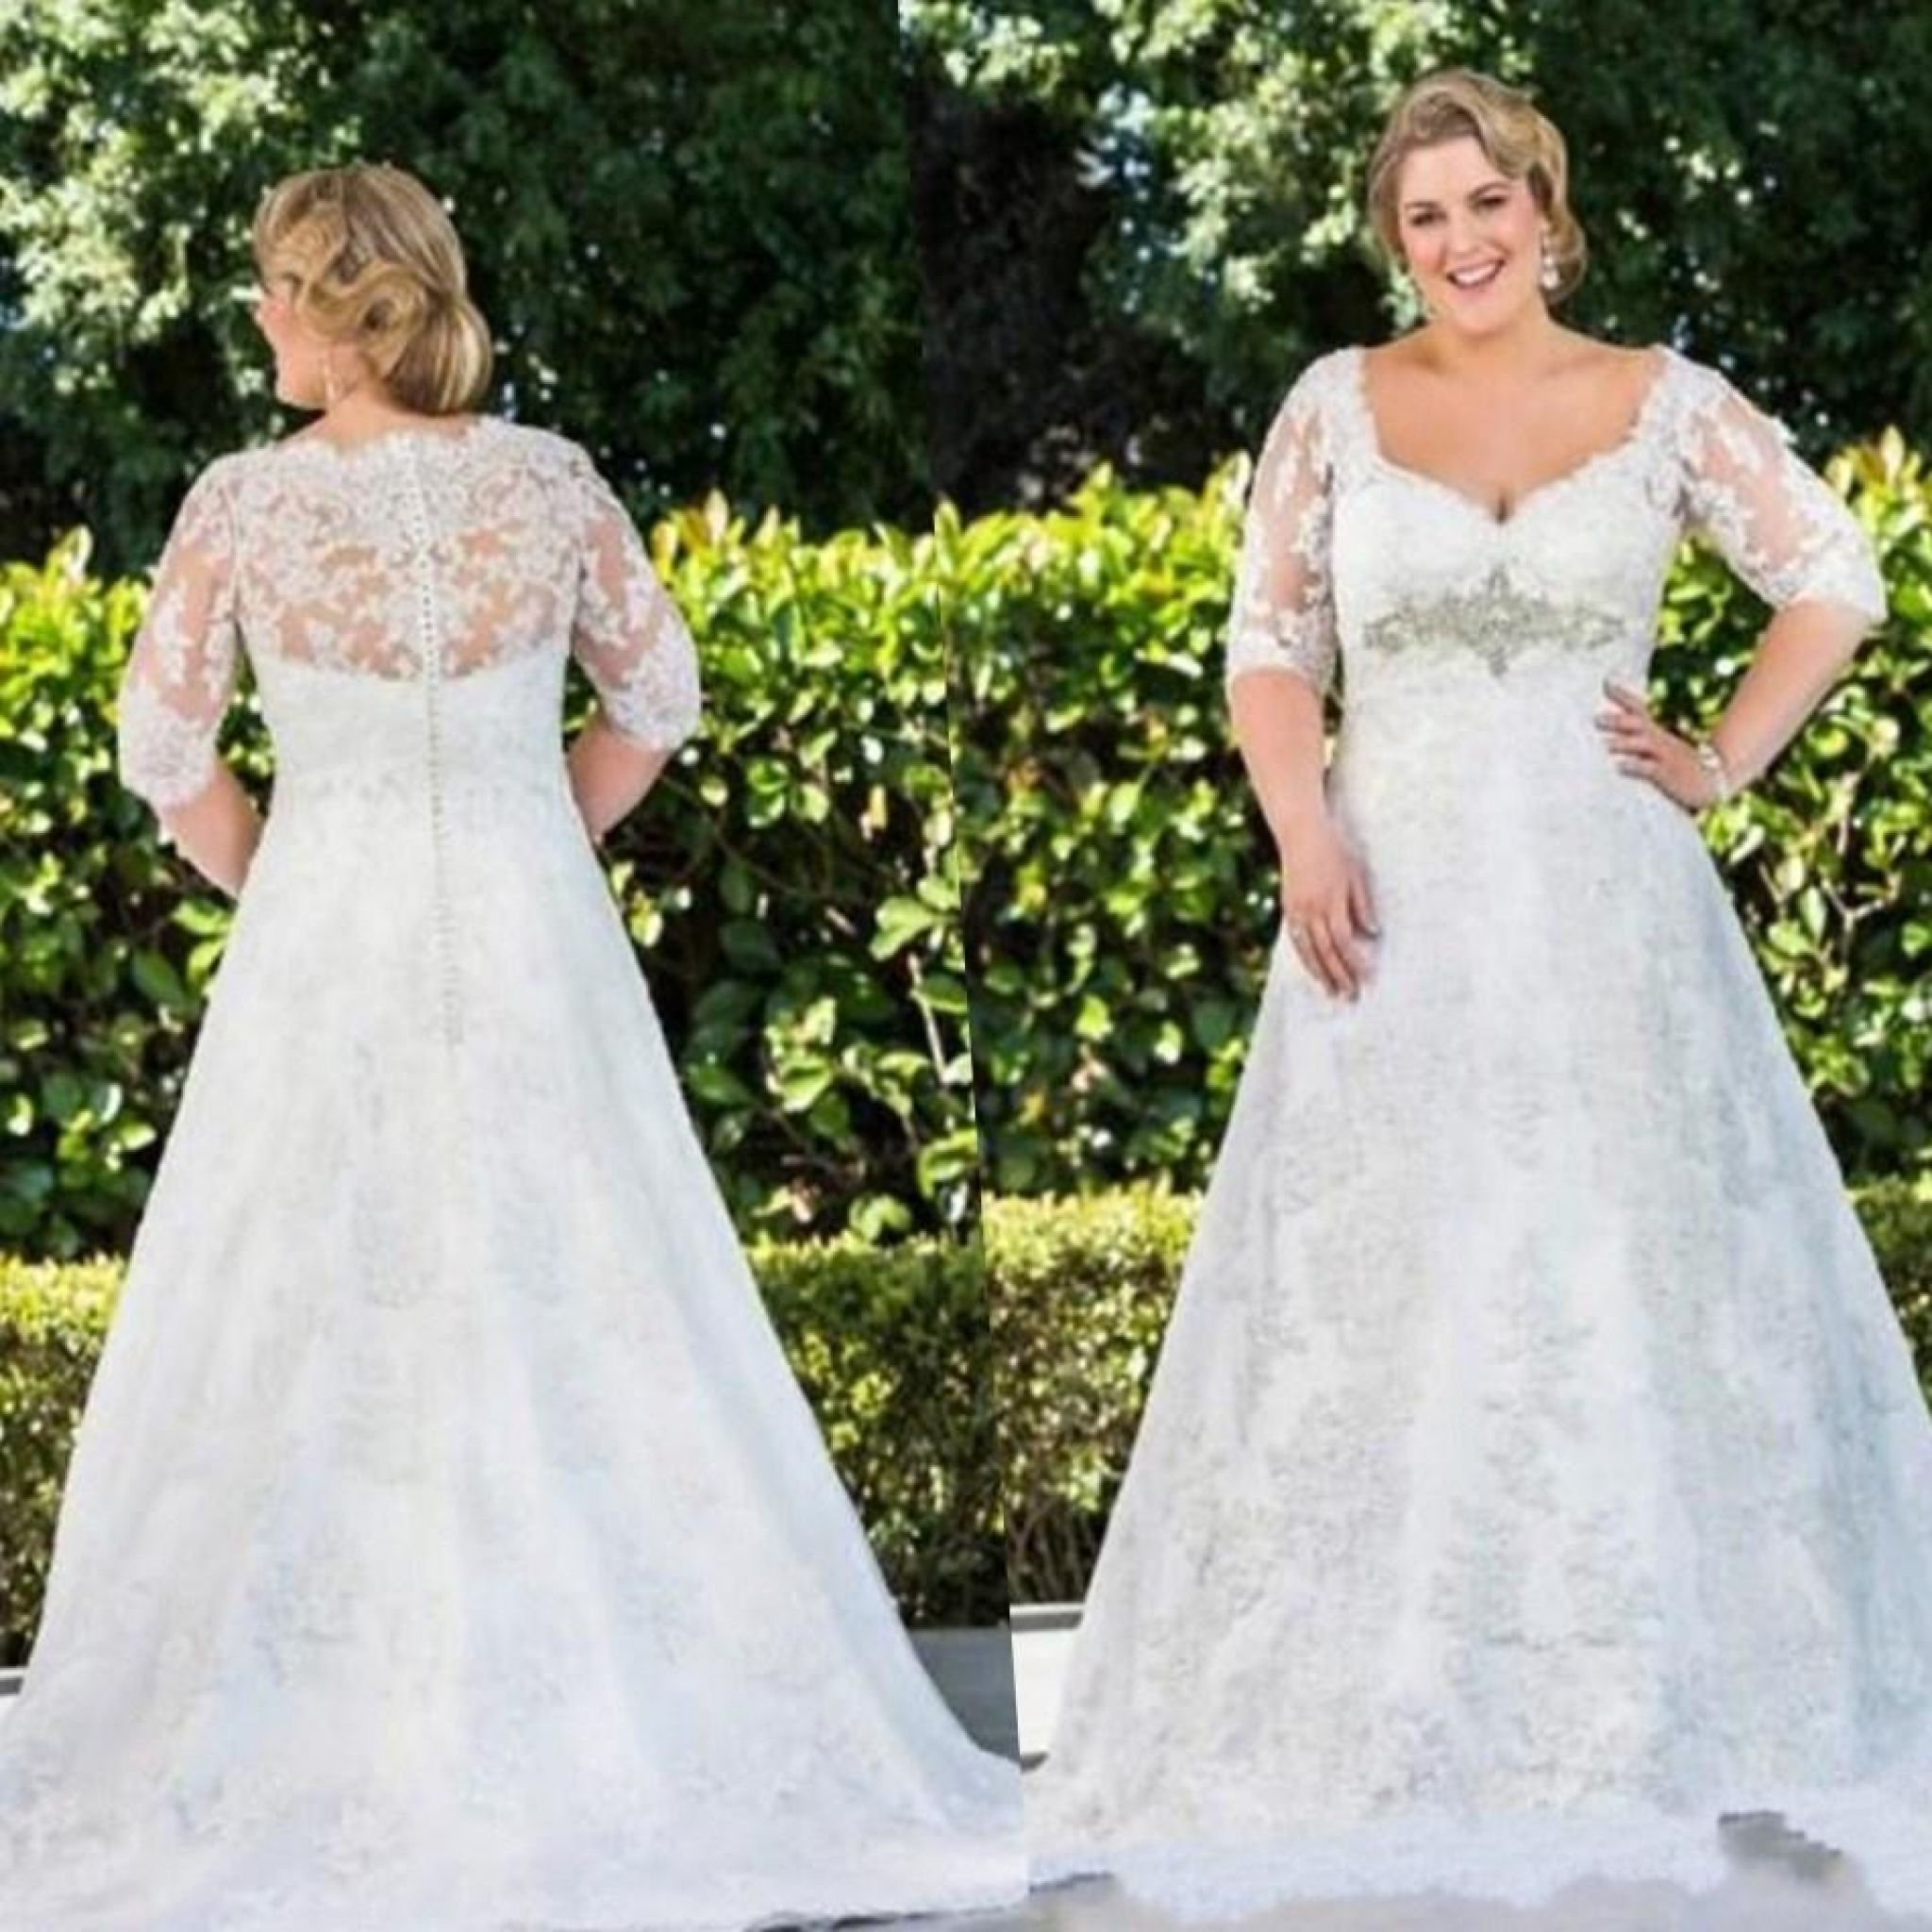 wedding dresses for fat brides - wedding dresses for cheap Check ...